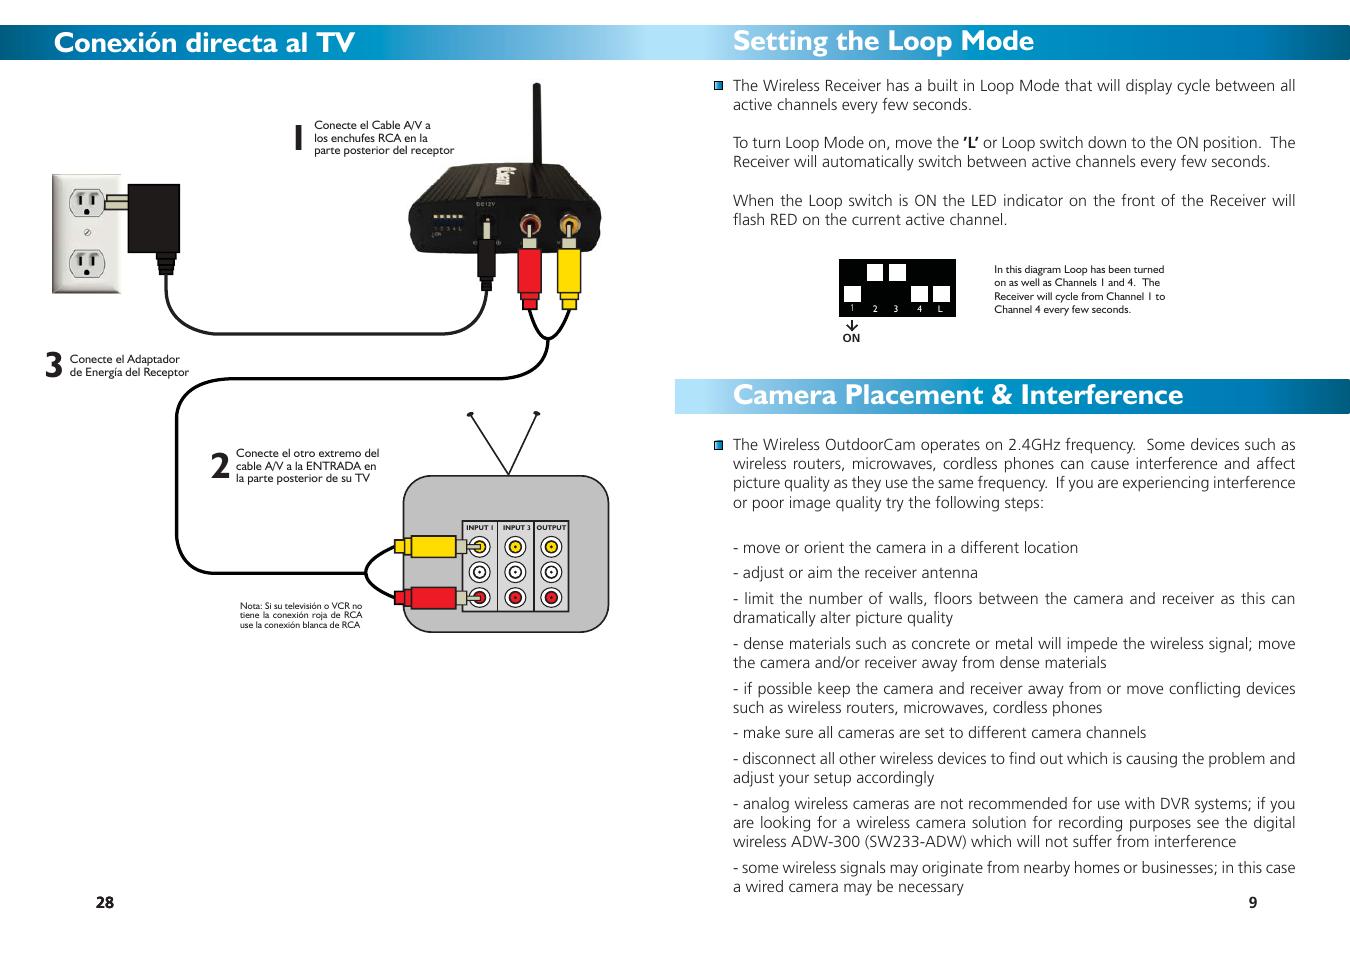 Conexin Directa Al Tv Swann Sw231 Woy User Manual Page 9 12 Wireless Camera Diagram